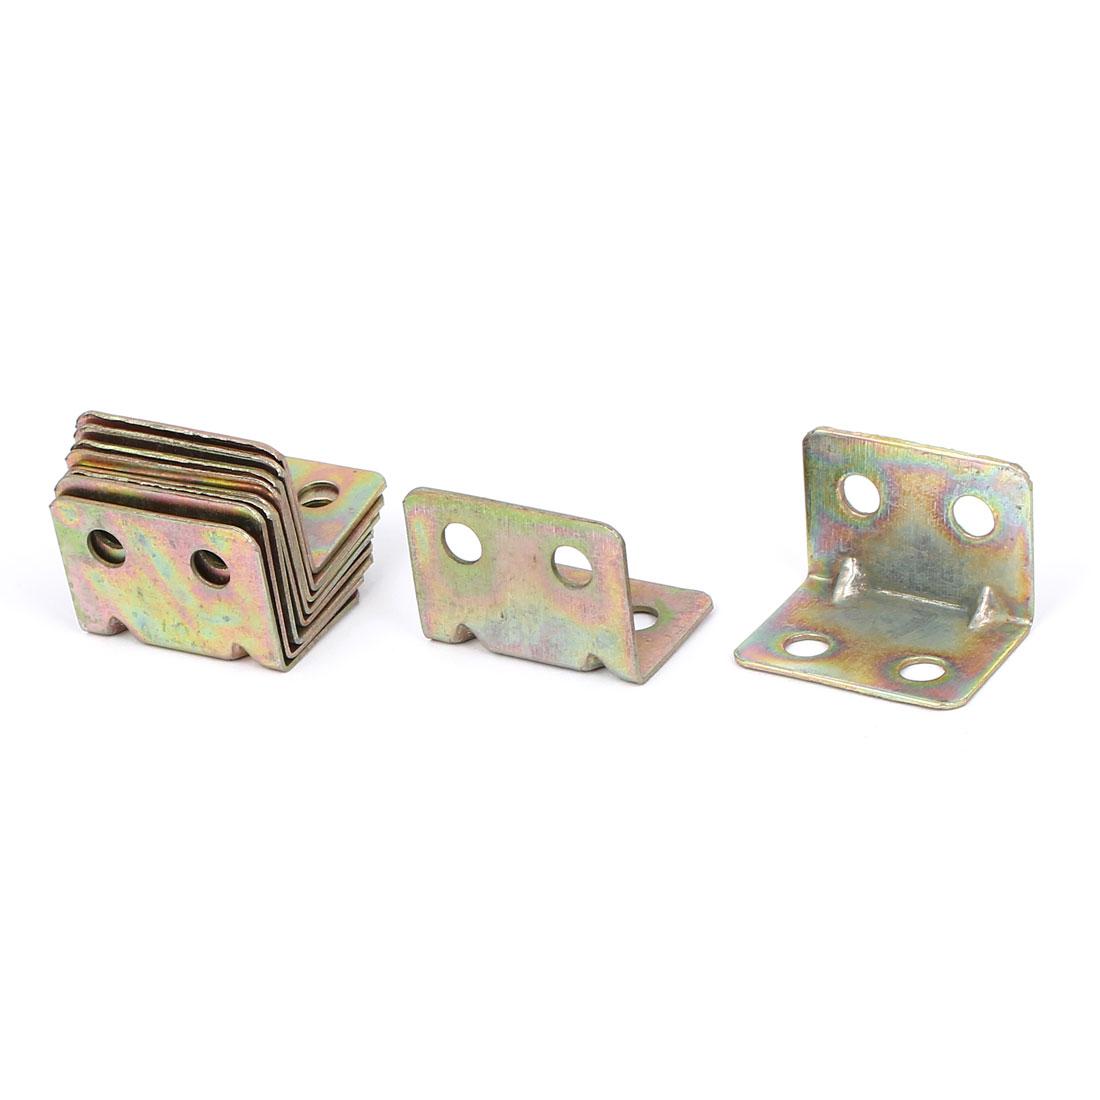 Corner Brace Joint Right Angle Bracket 20x20x28mm Bronze Tone 10pcs